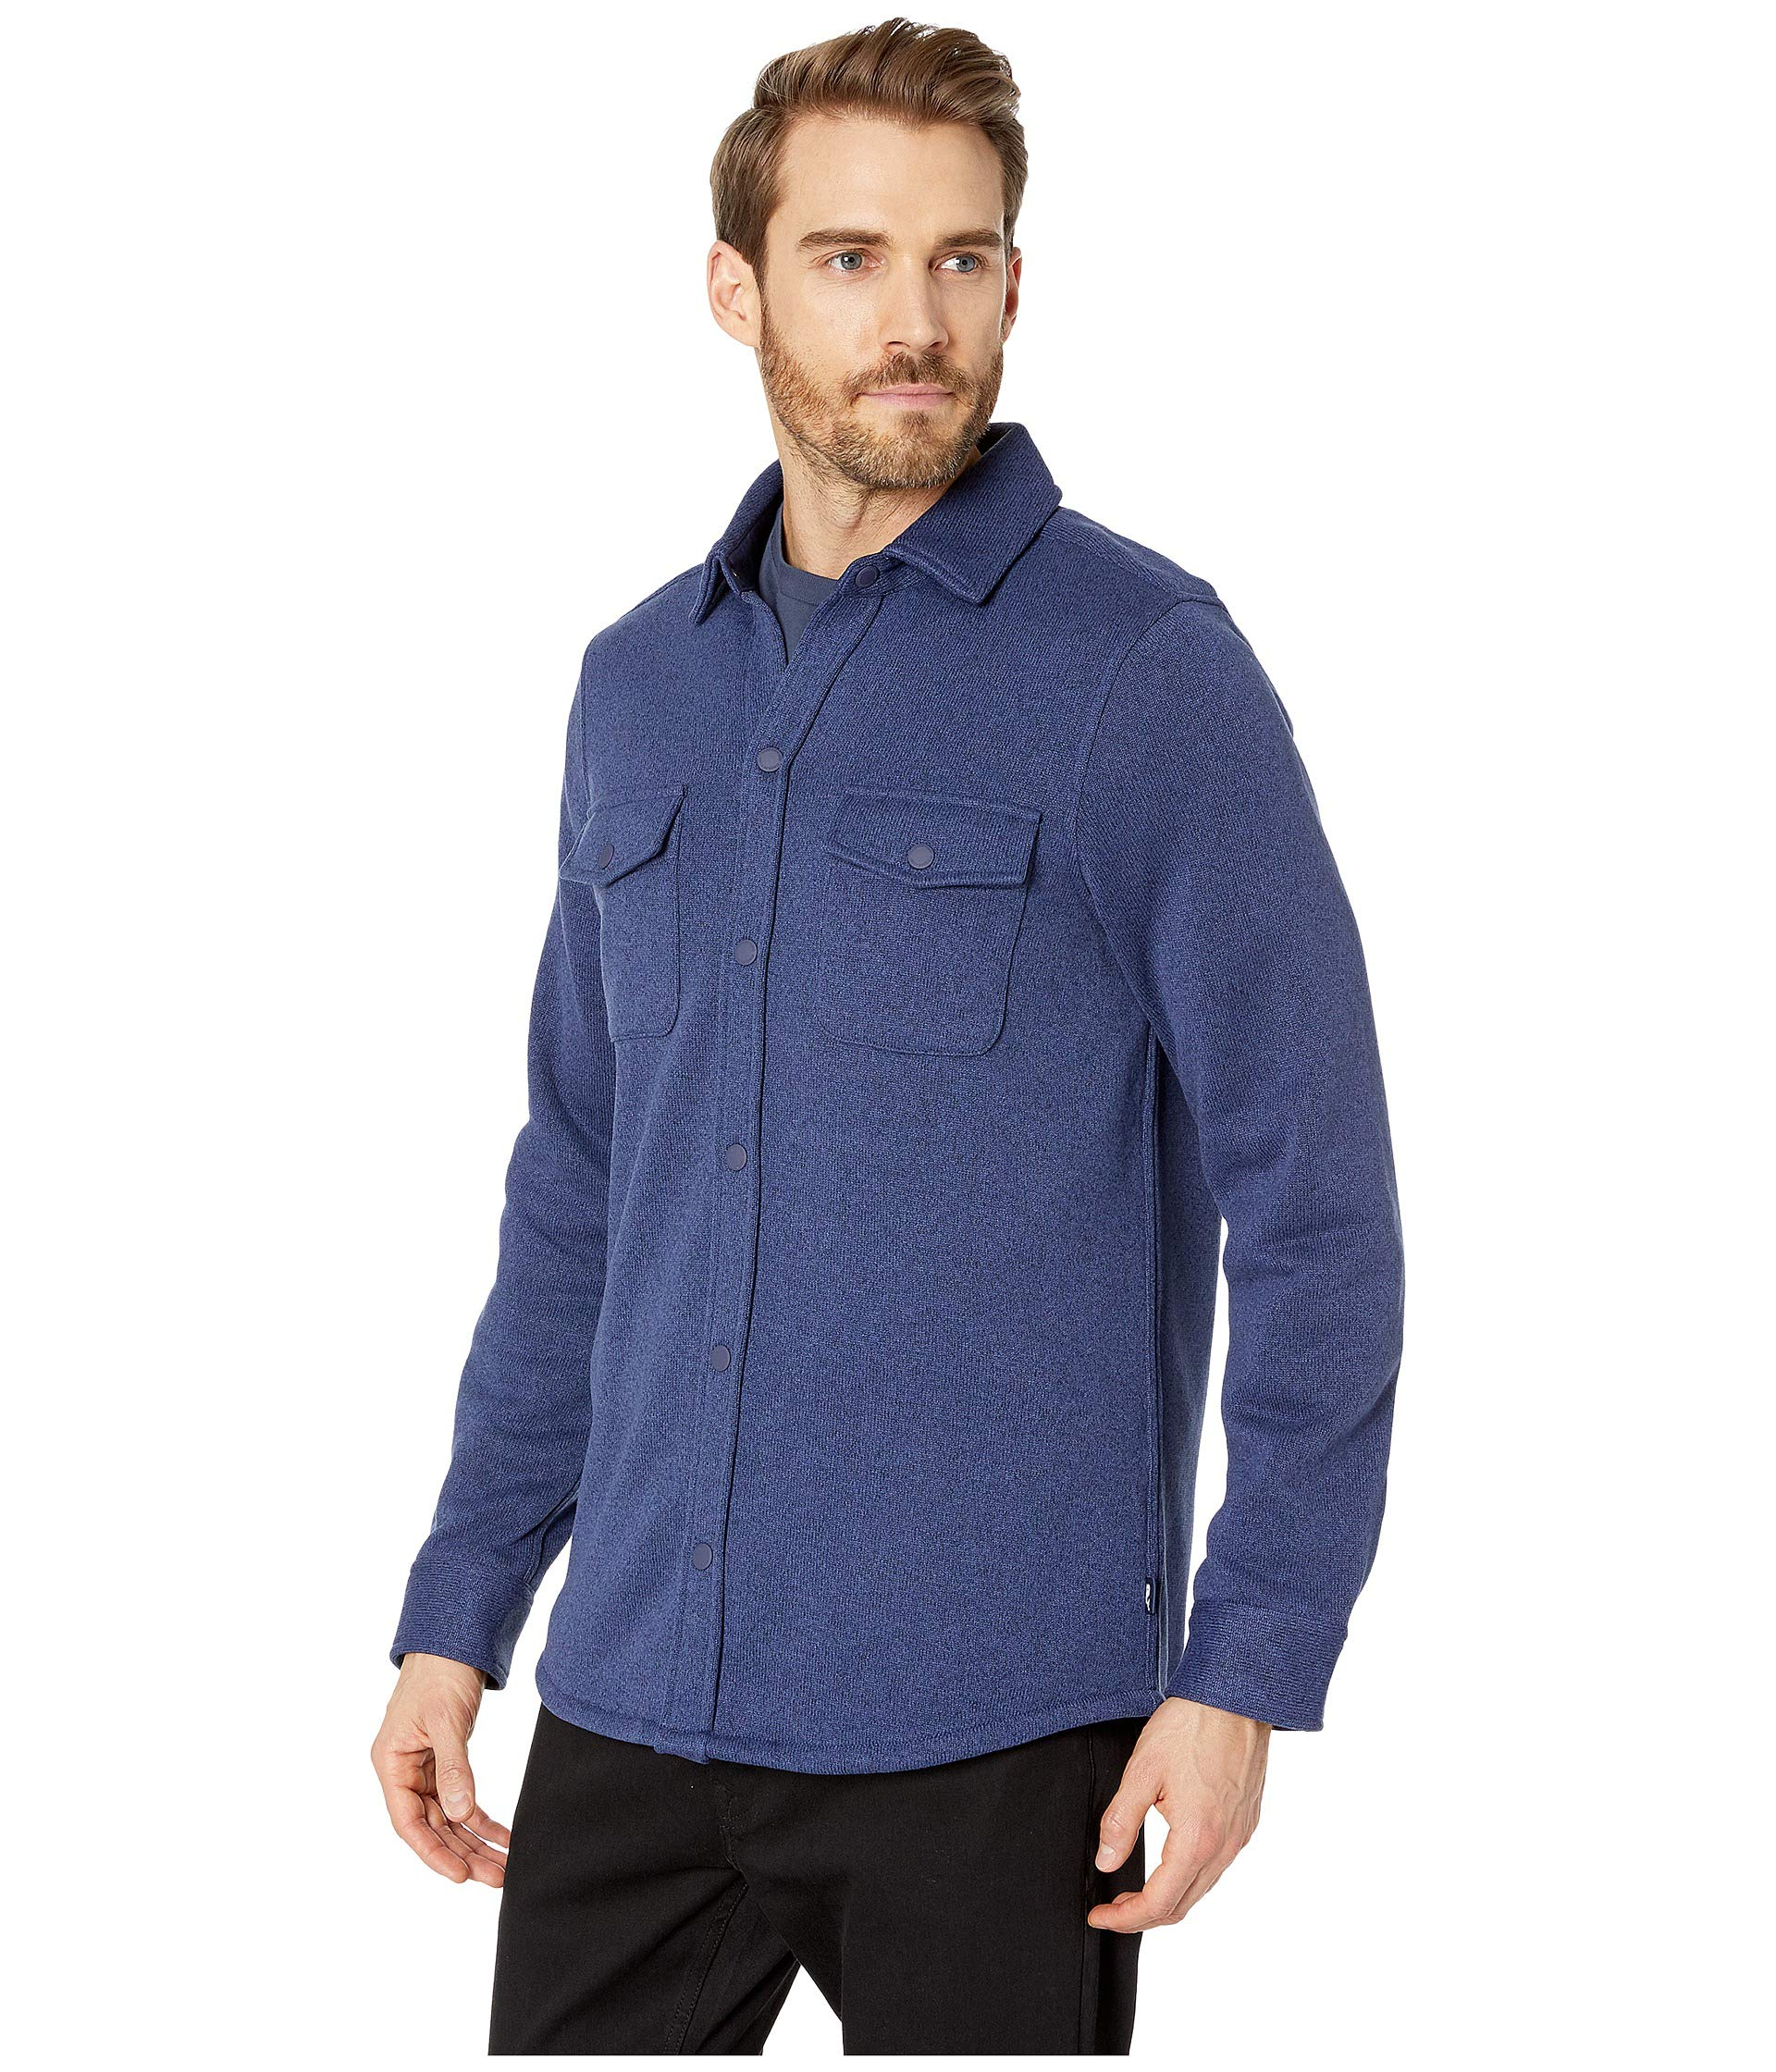 Bay Jacket Vines Vineyard Knit Deep Shirt q4wOX6